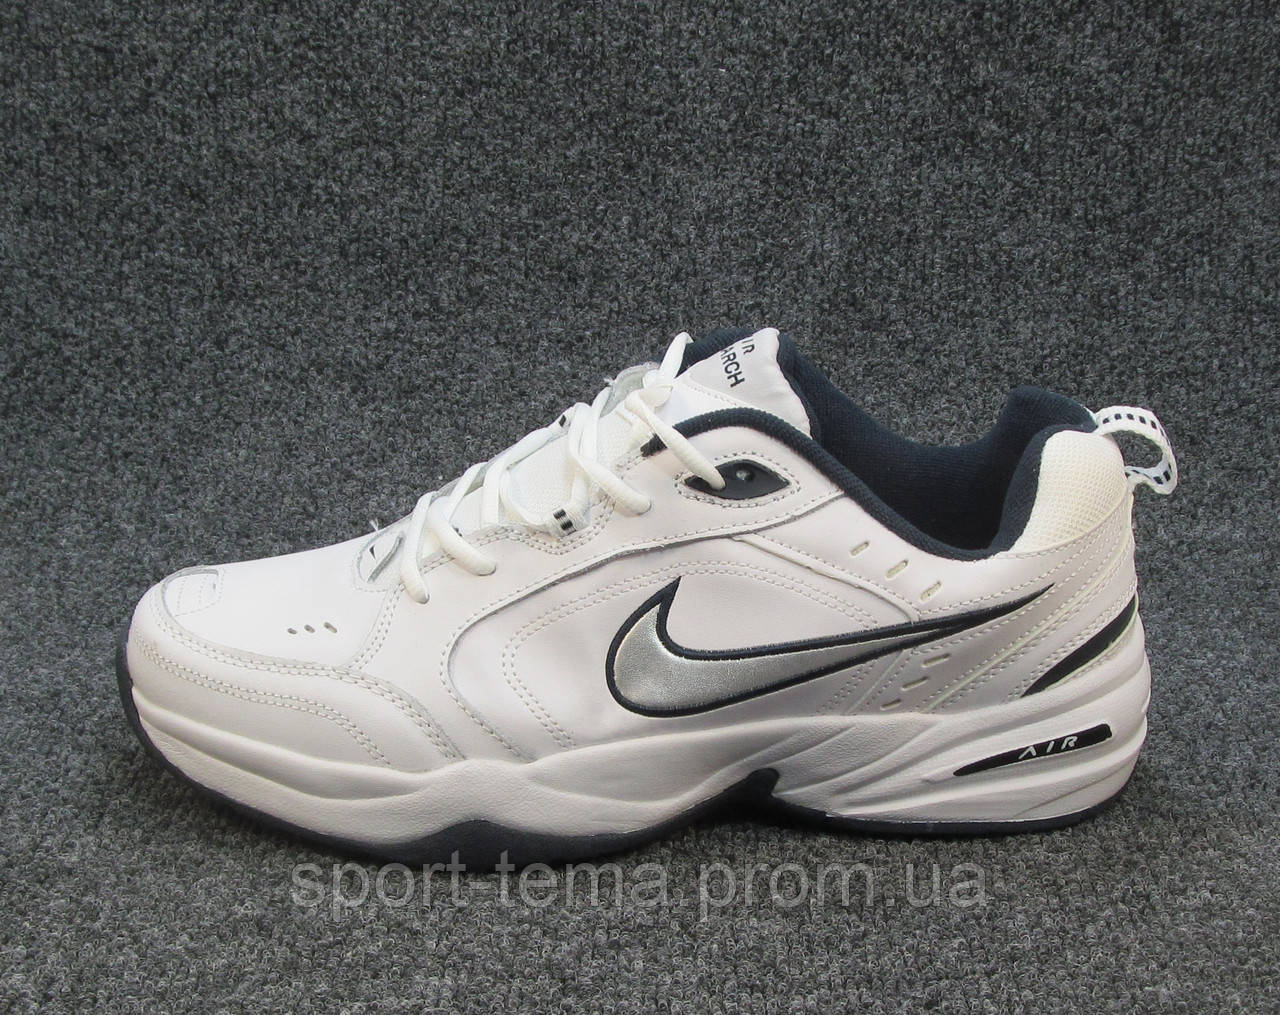 ceb1494e65f3bd Кроссовки Мужские Nike Air Monarch Белые (найк Аир )(р.46) — в ...